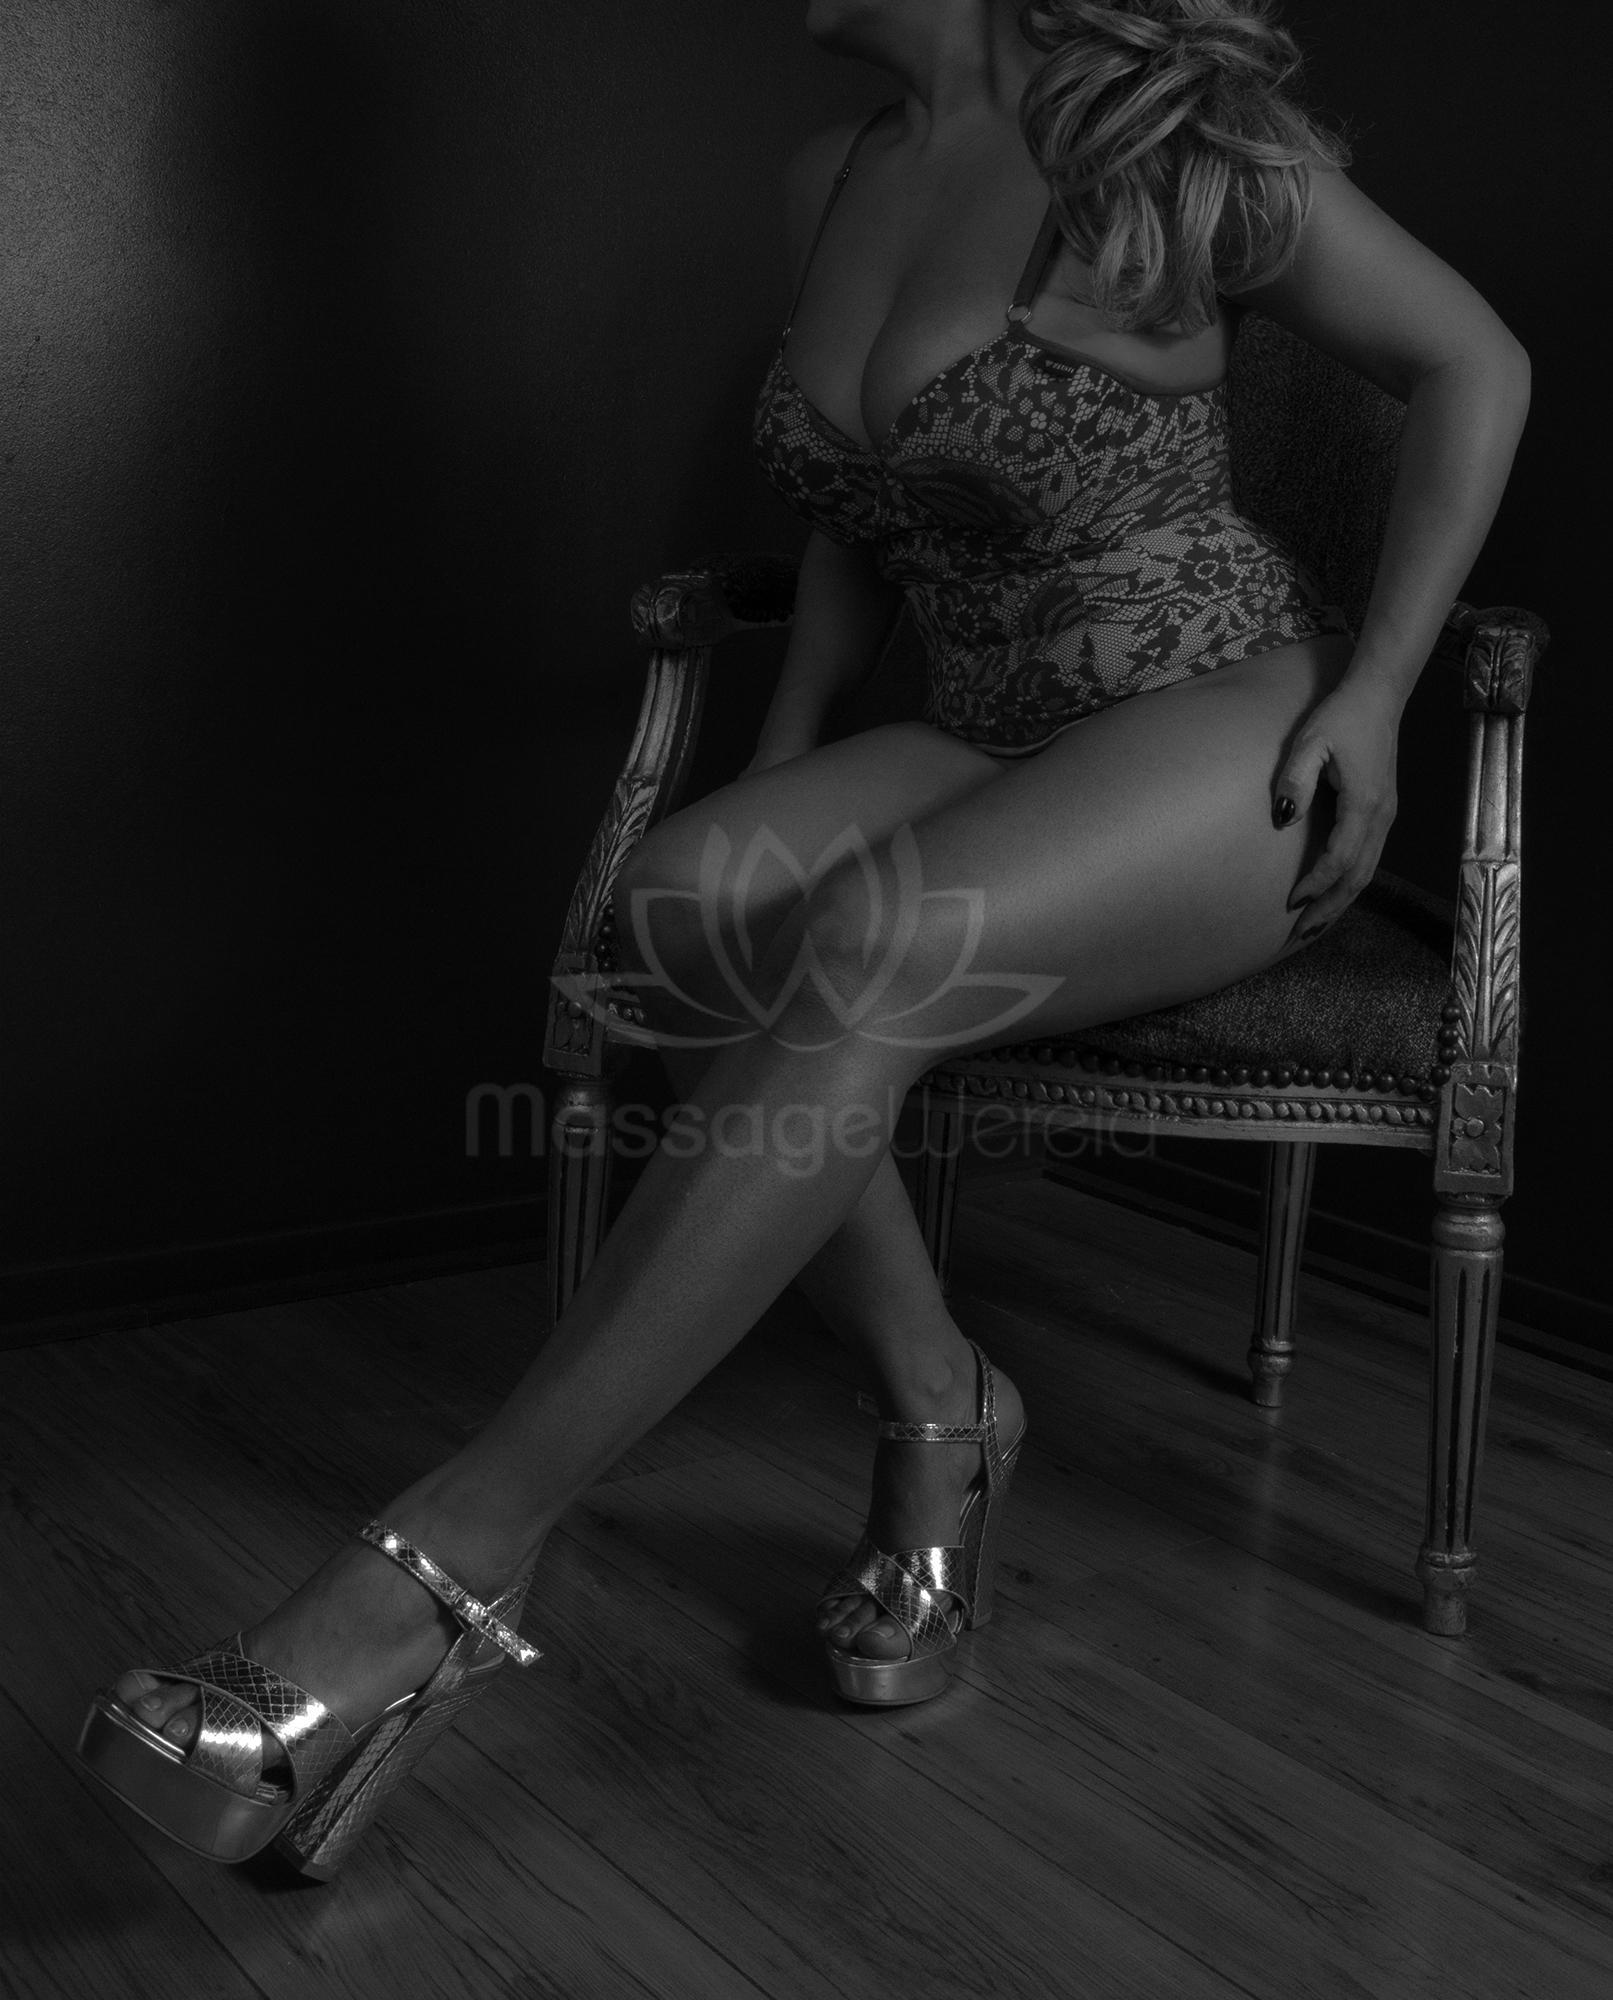 Camilla from MassageWereld